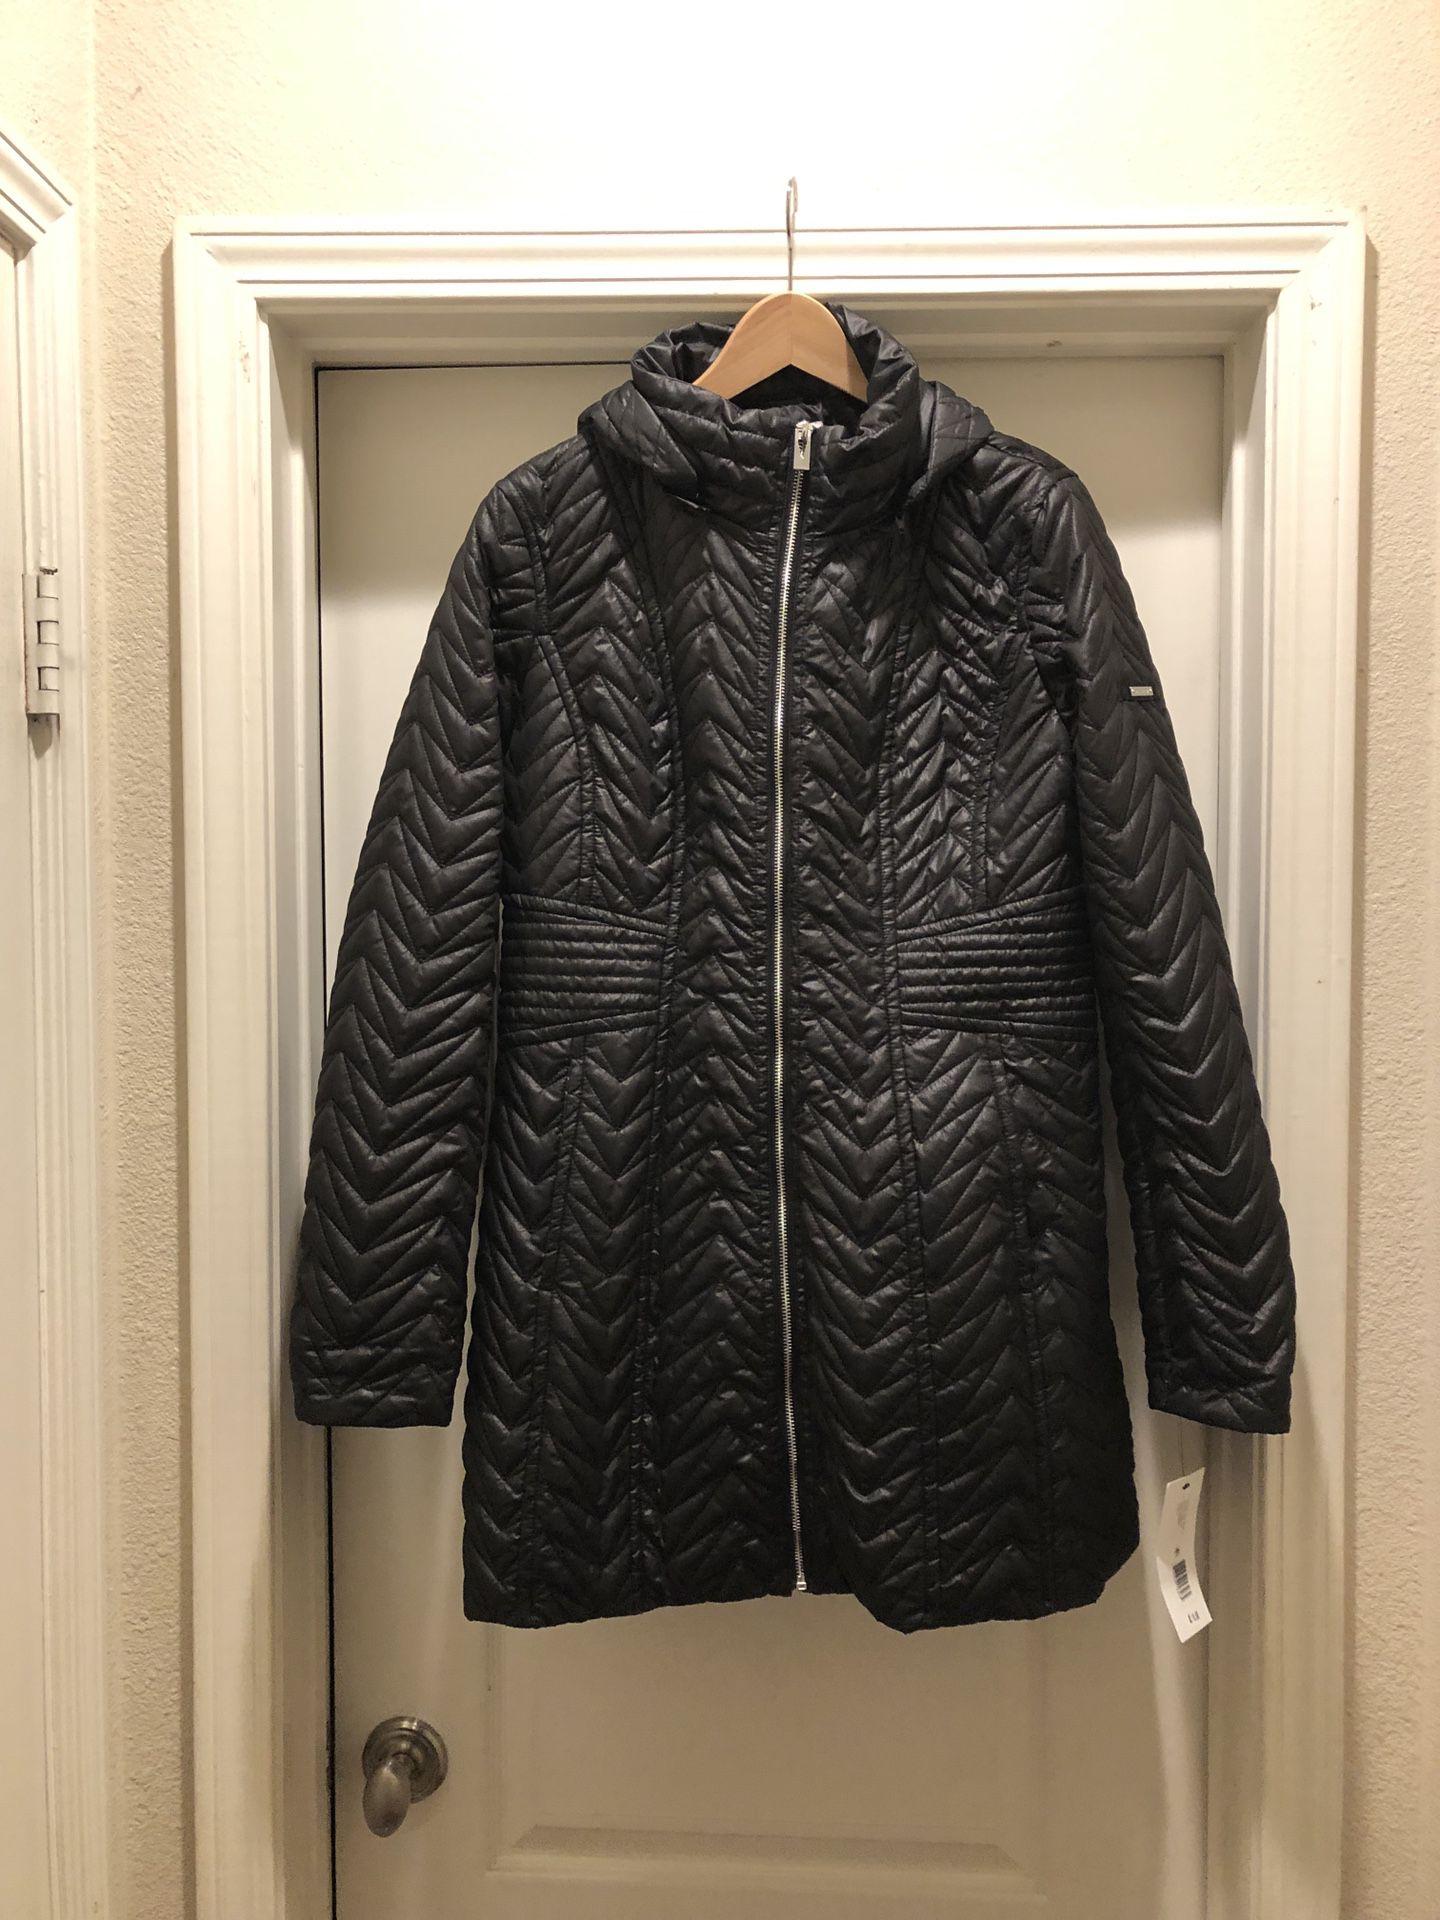 Brand new VIA SPIGA coat jacket